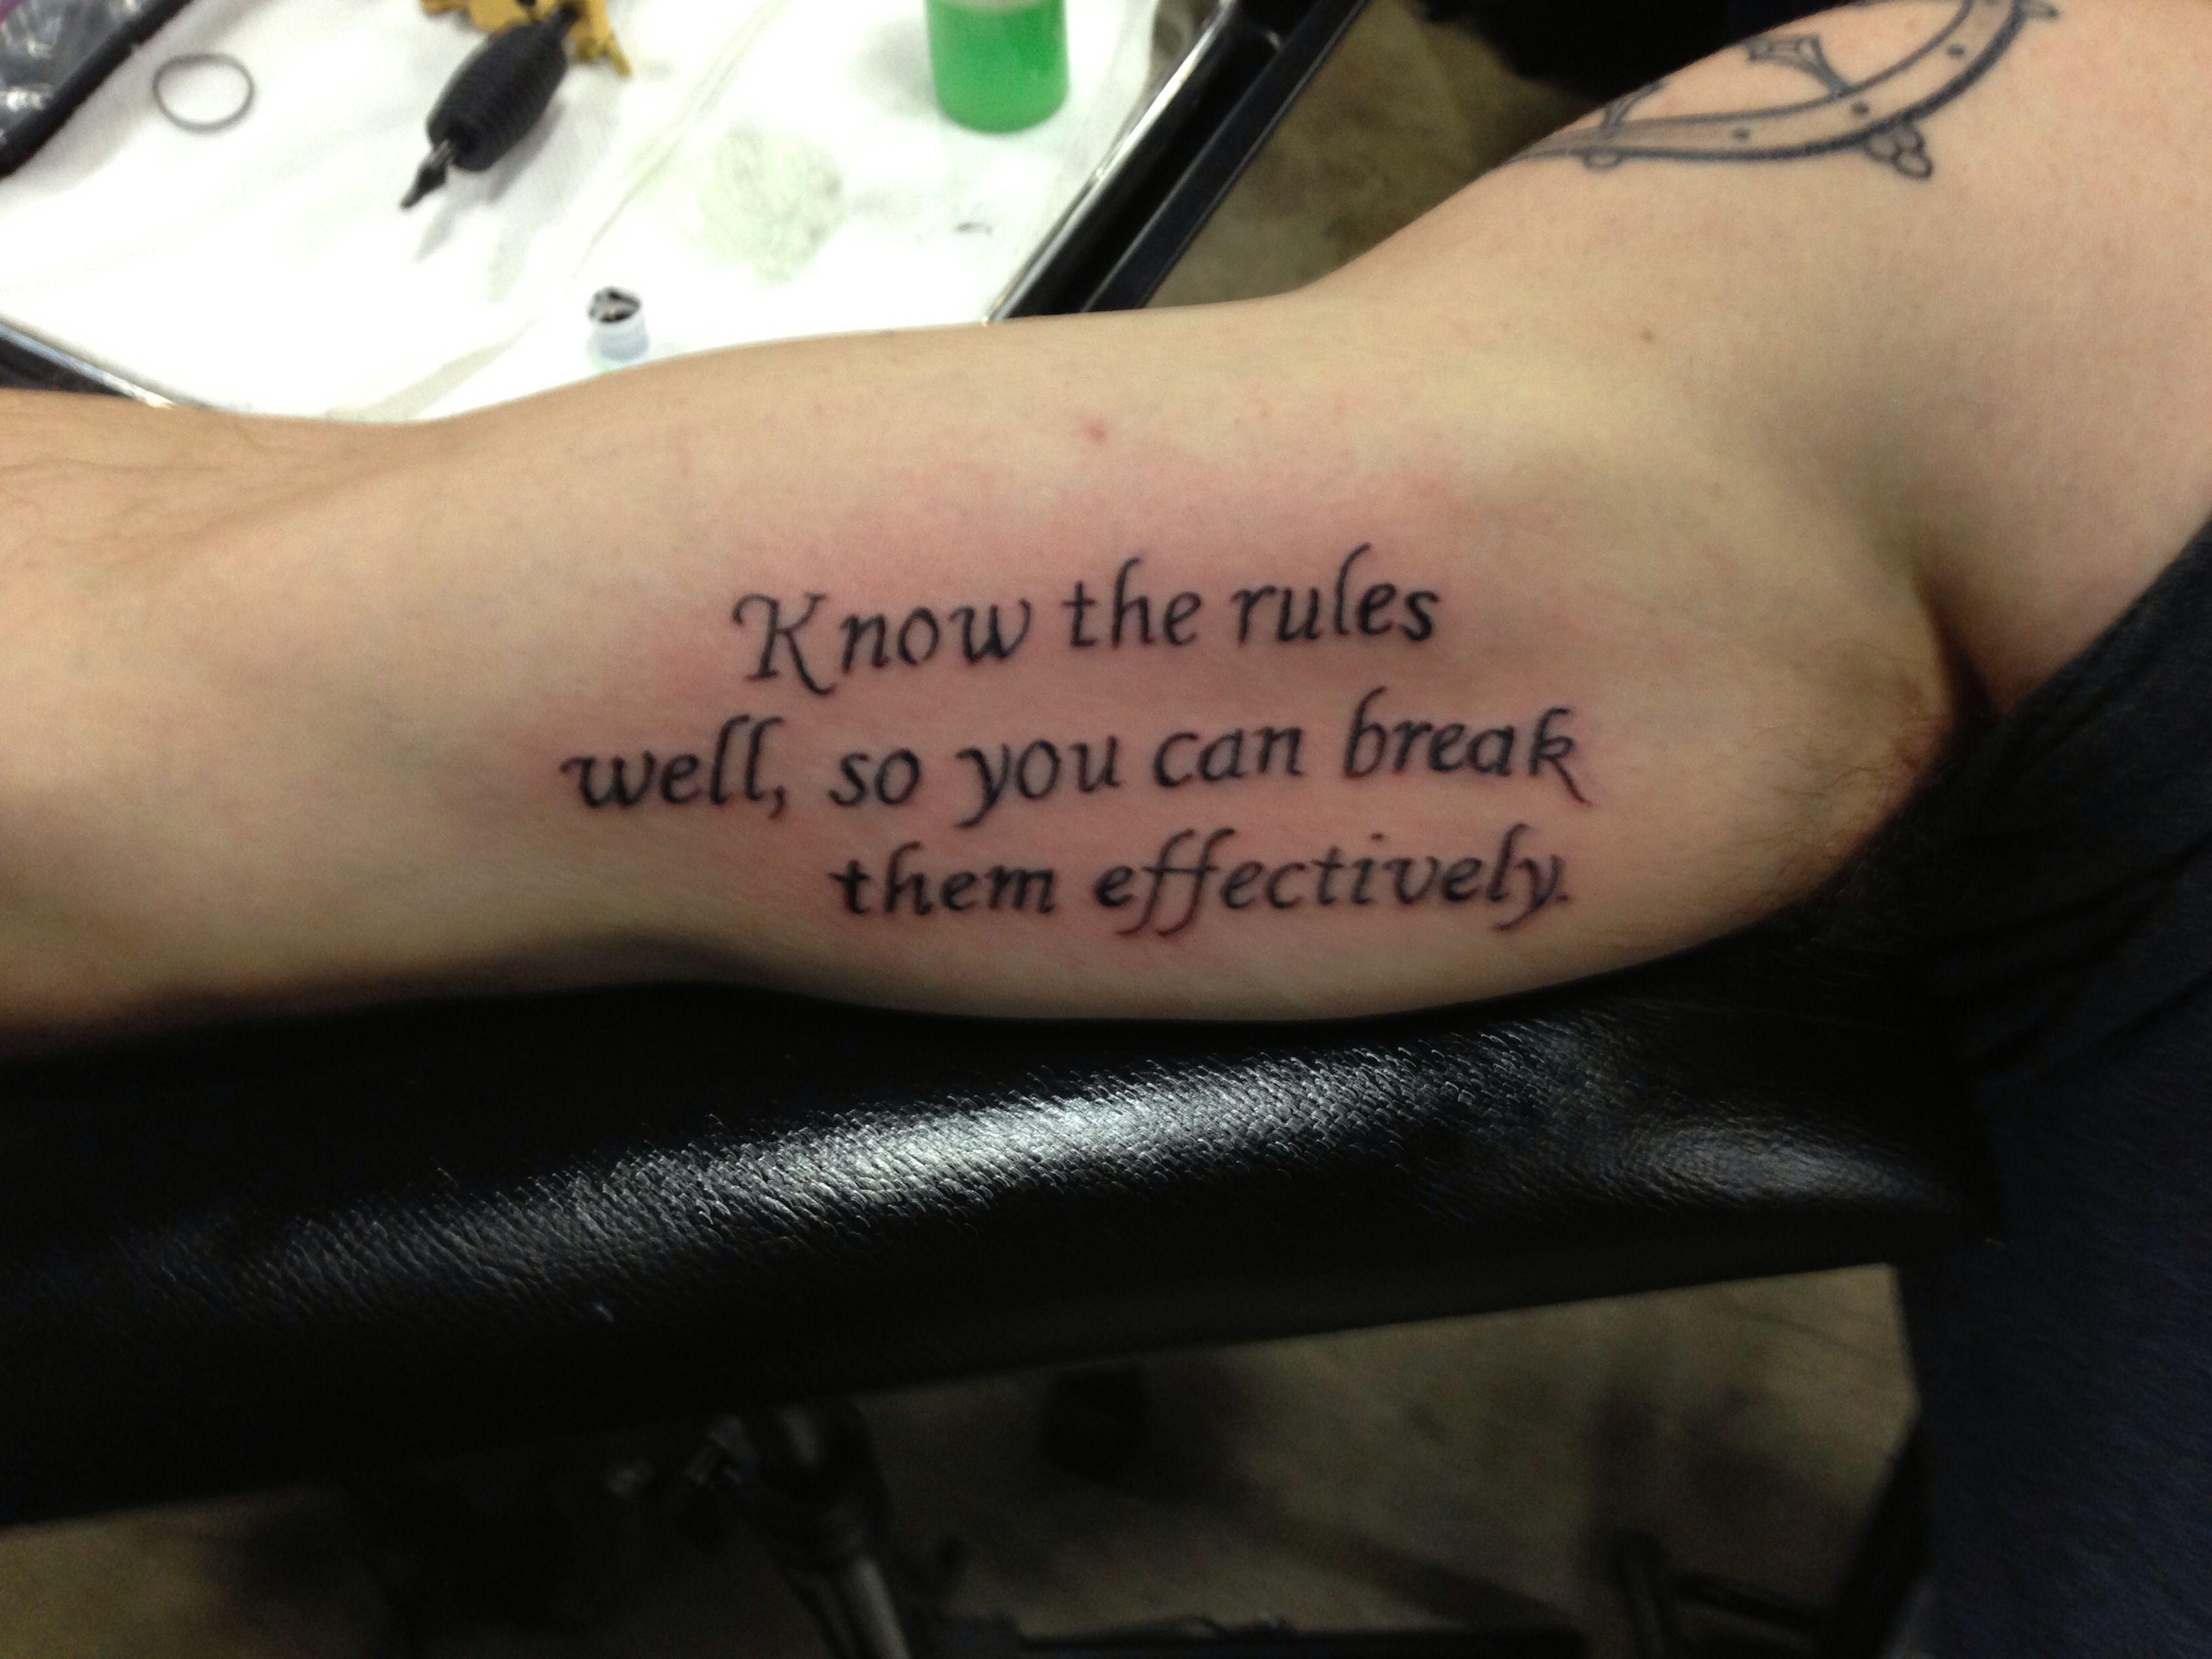 Tattoo - Dalai Lama quote | Tats | Pinterest - Tattoo Sprüche Weisheiten